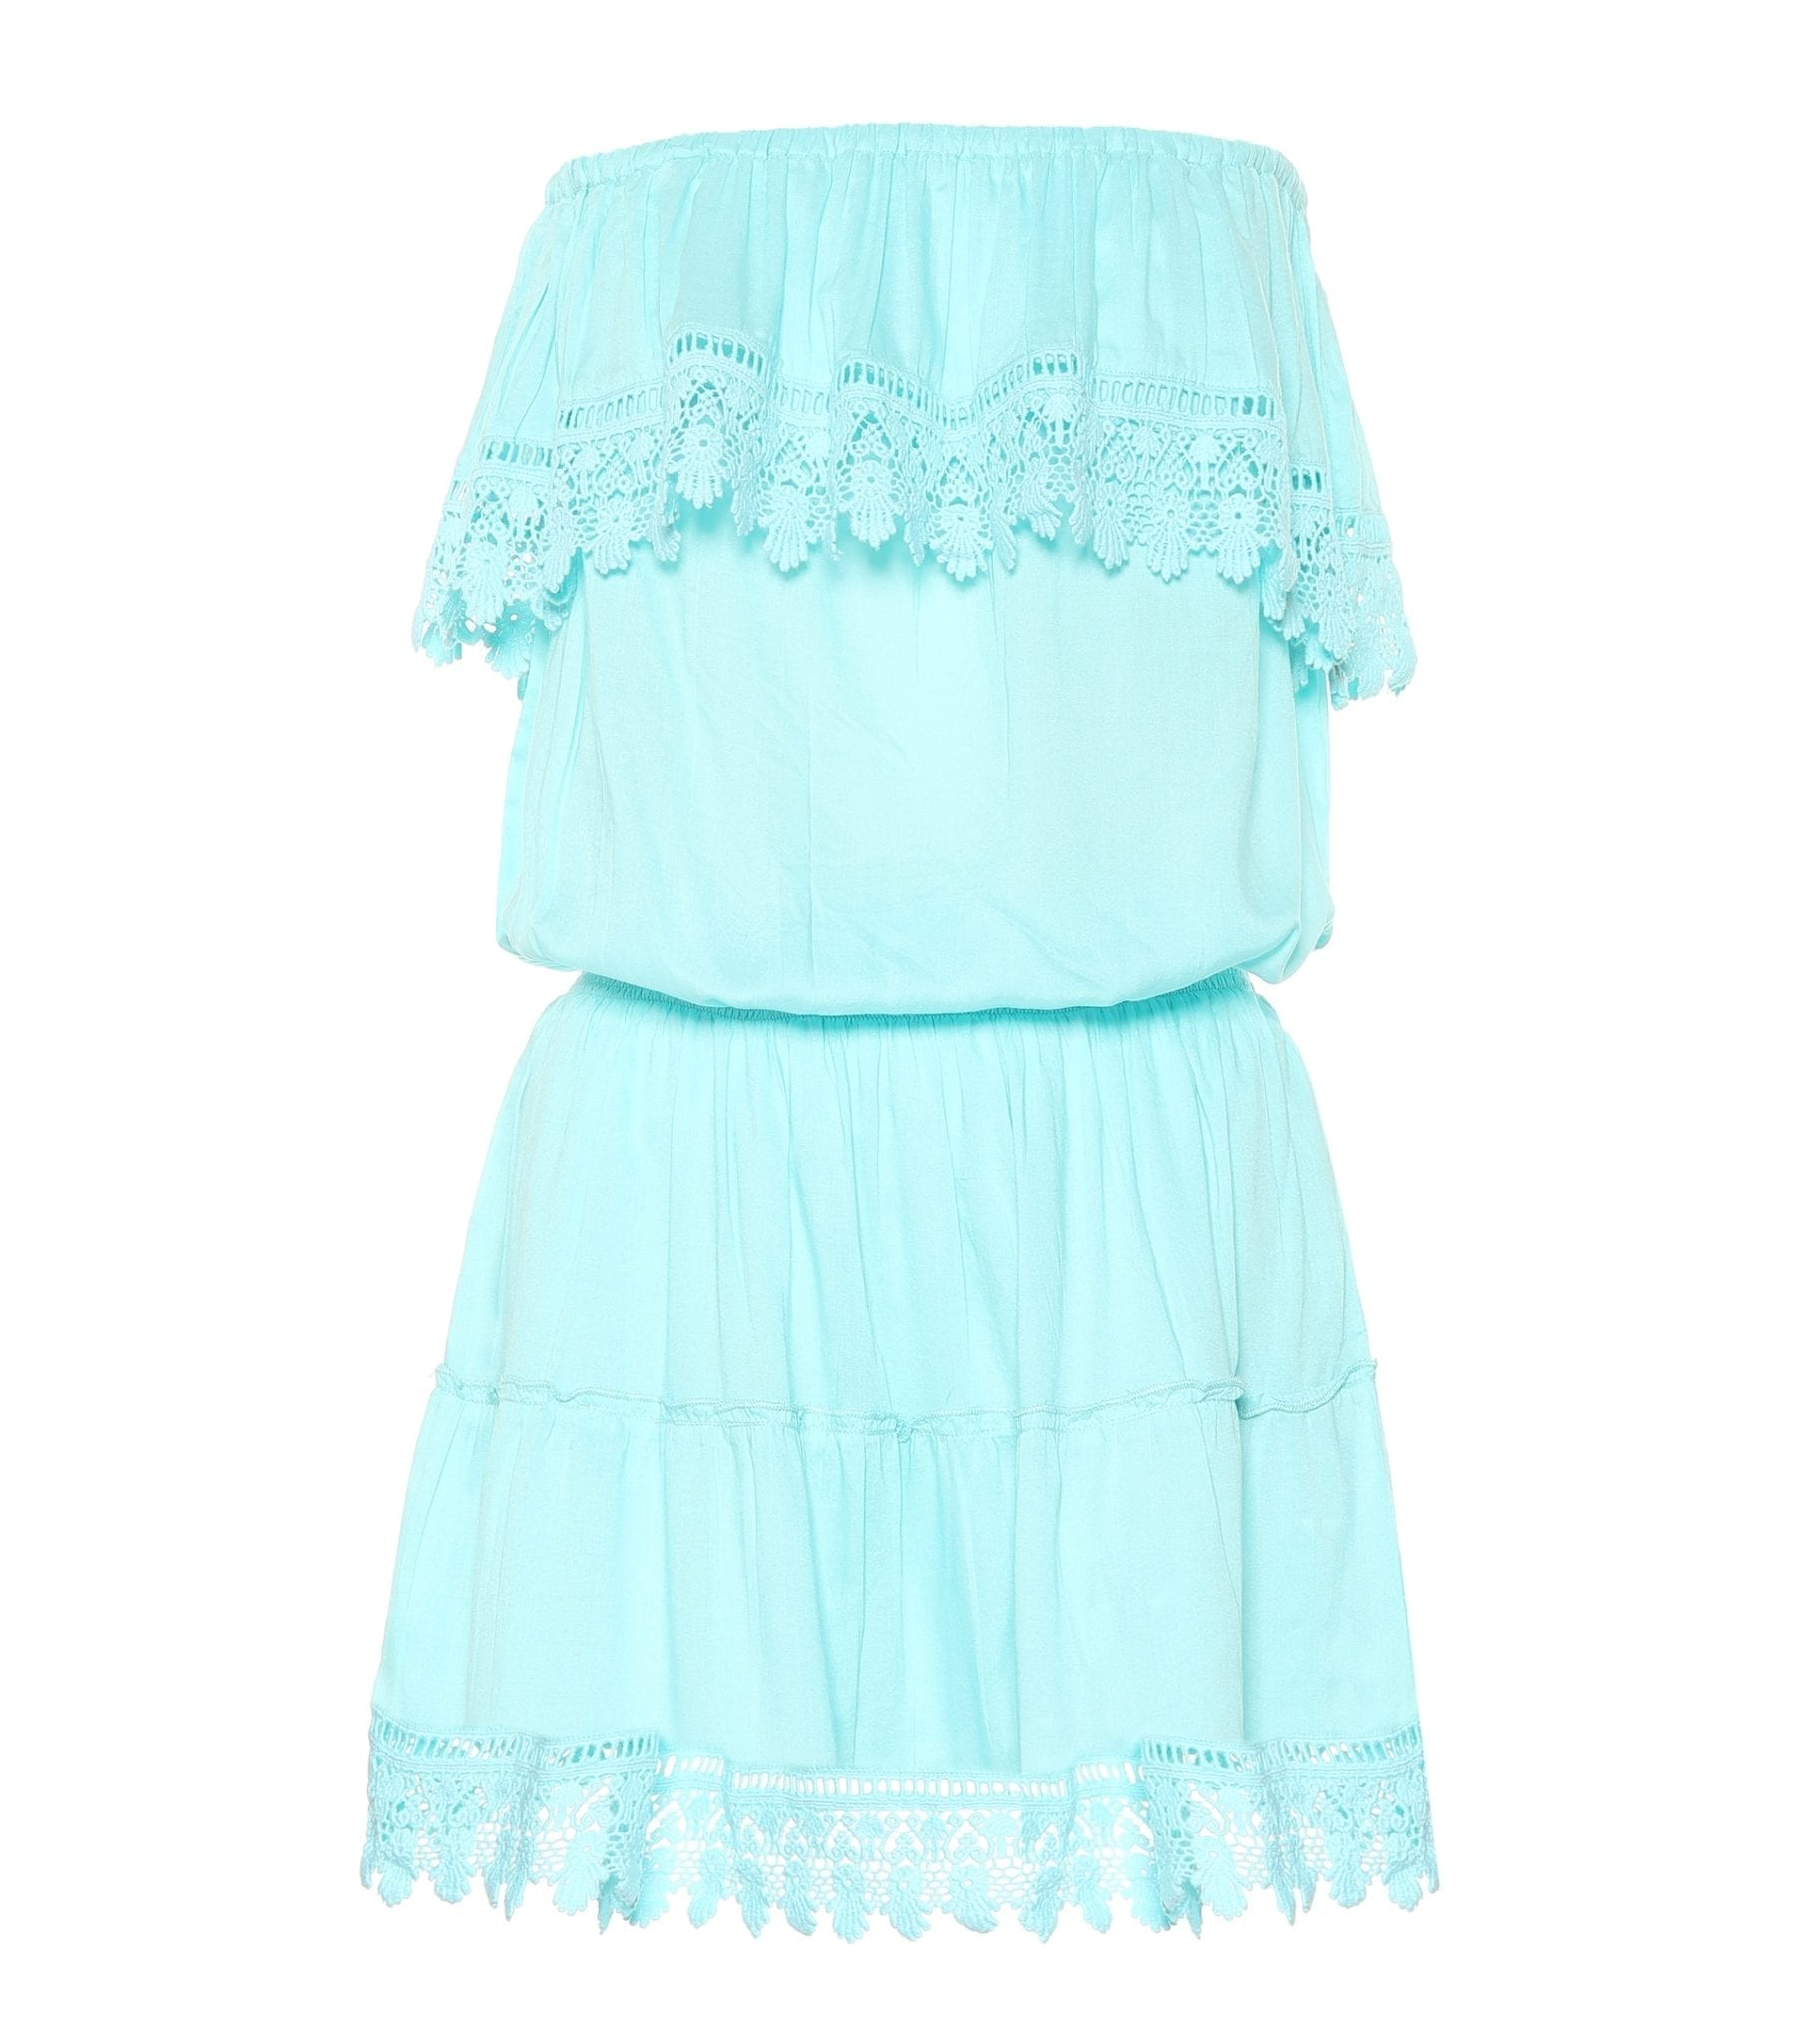 MELISSA ODABASH Joy Strapless Mini Sky Dress